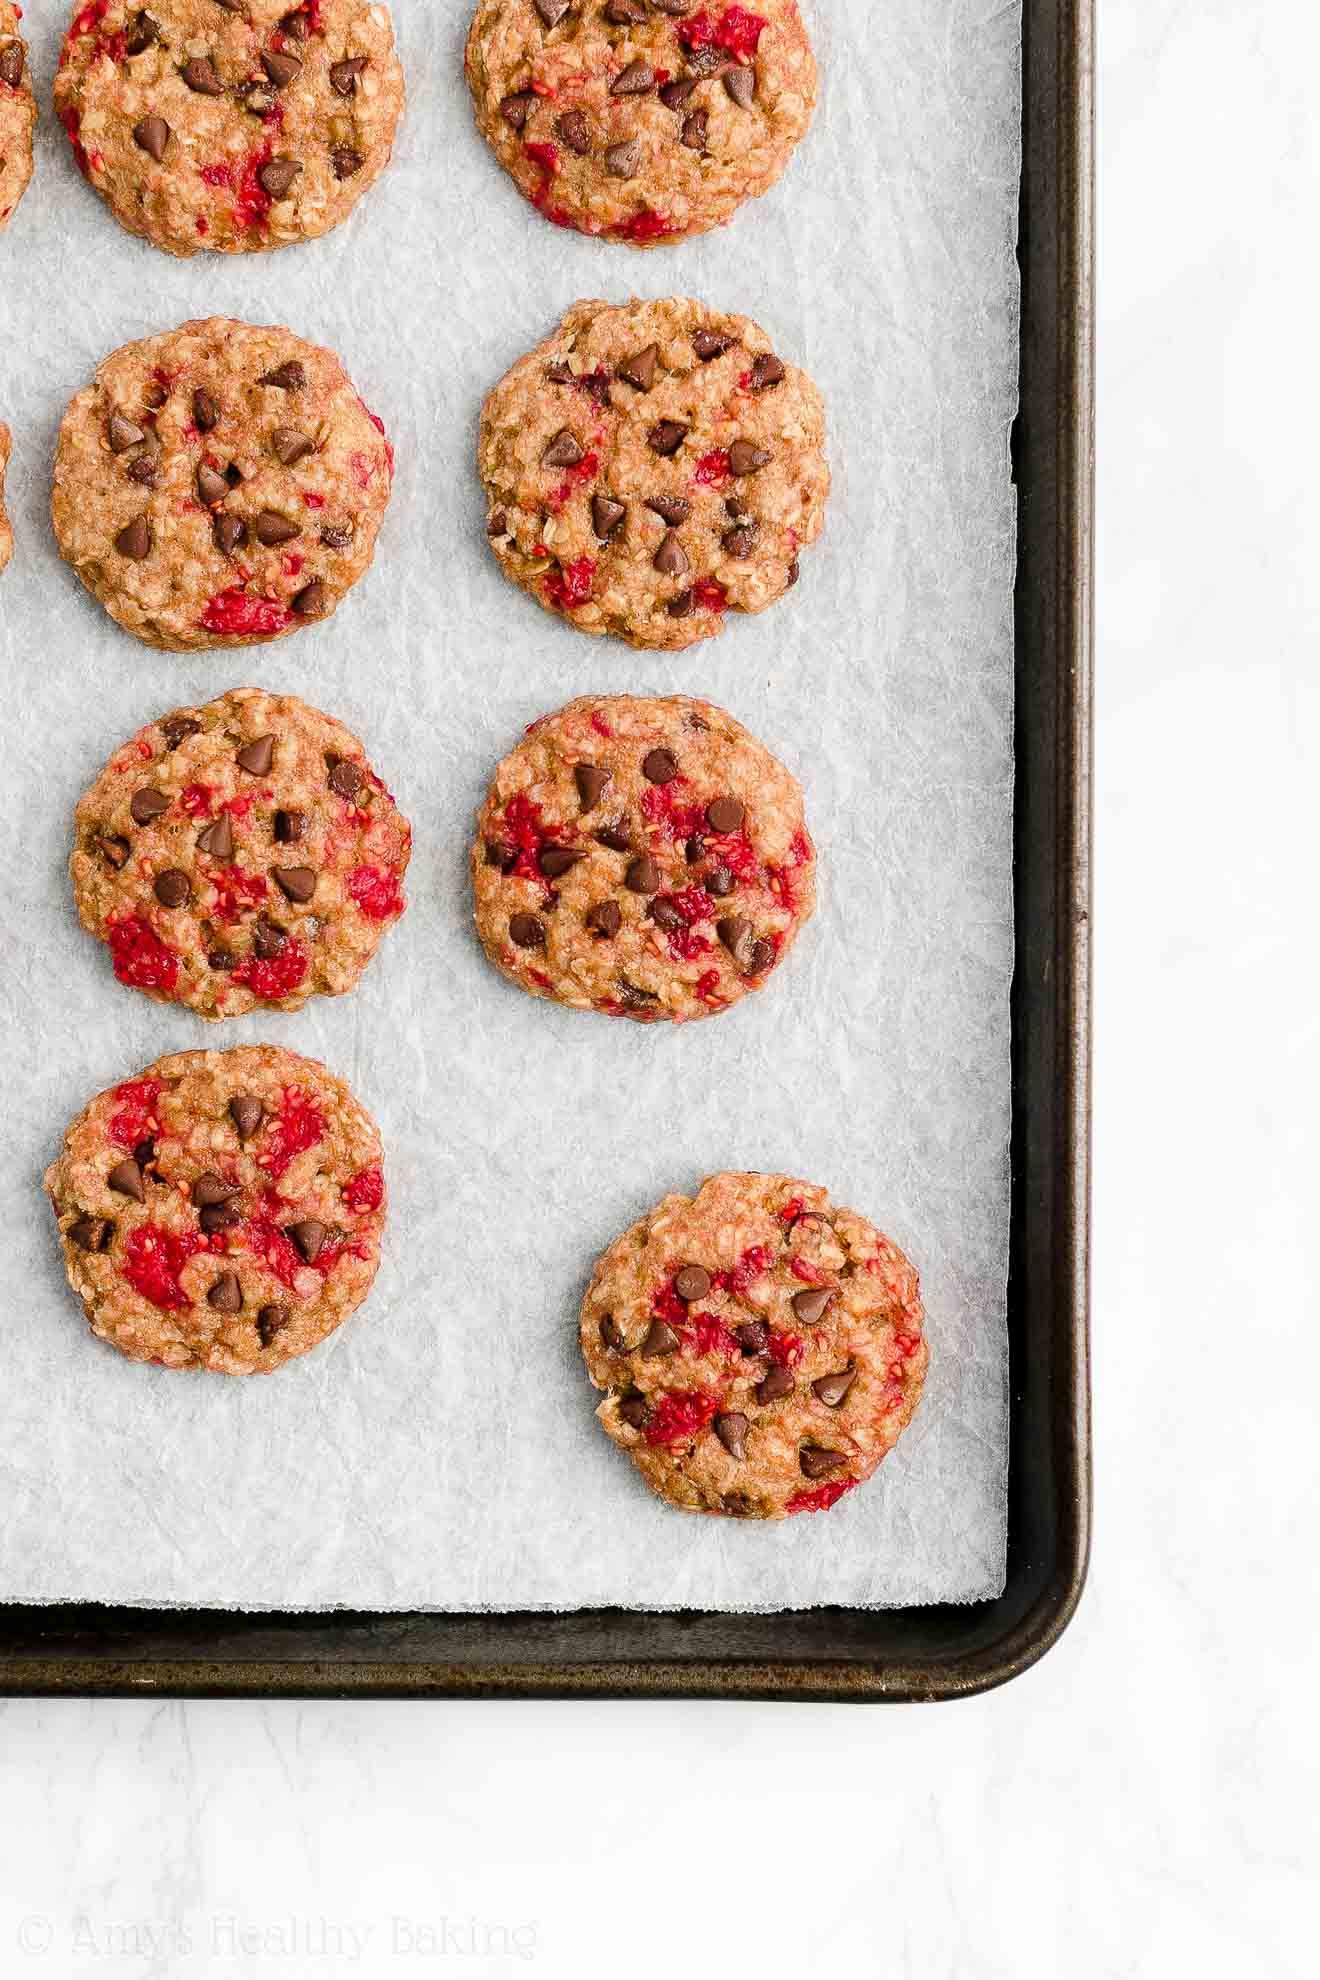 Easy Healthy Dairy Free Raspberry Chocolate Chip Oatmeal Breakfast Cookies